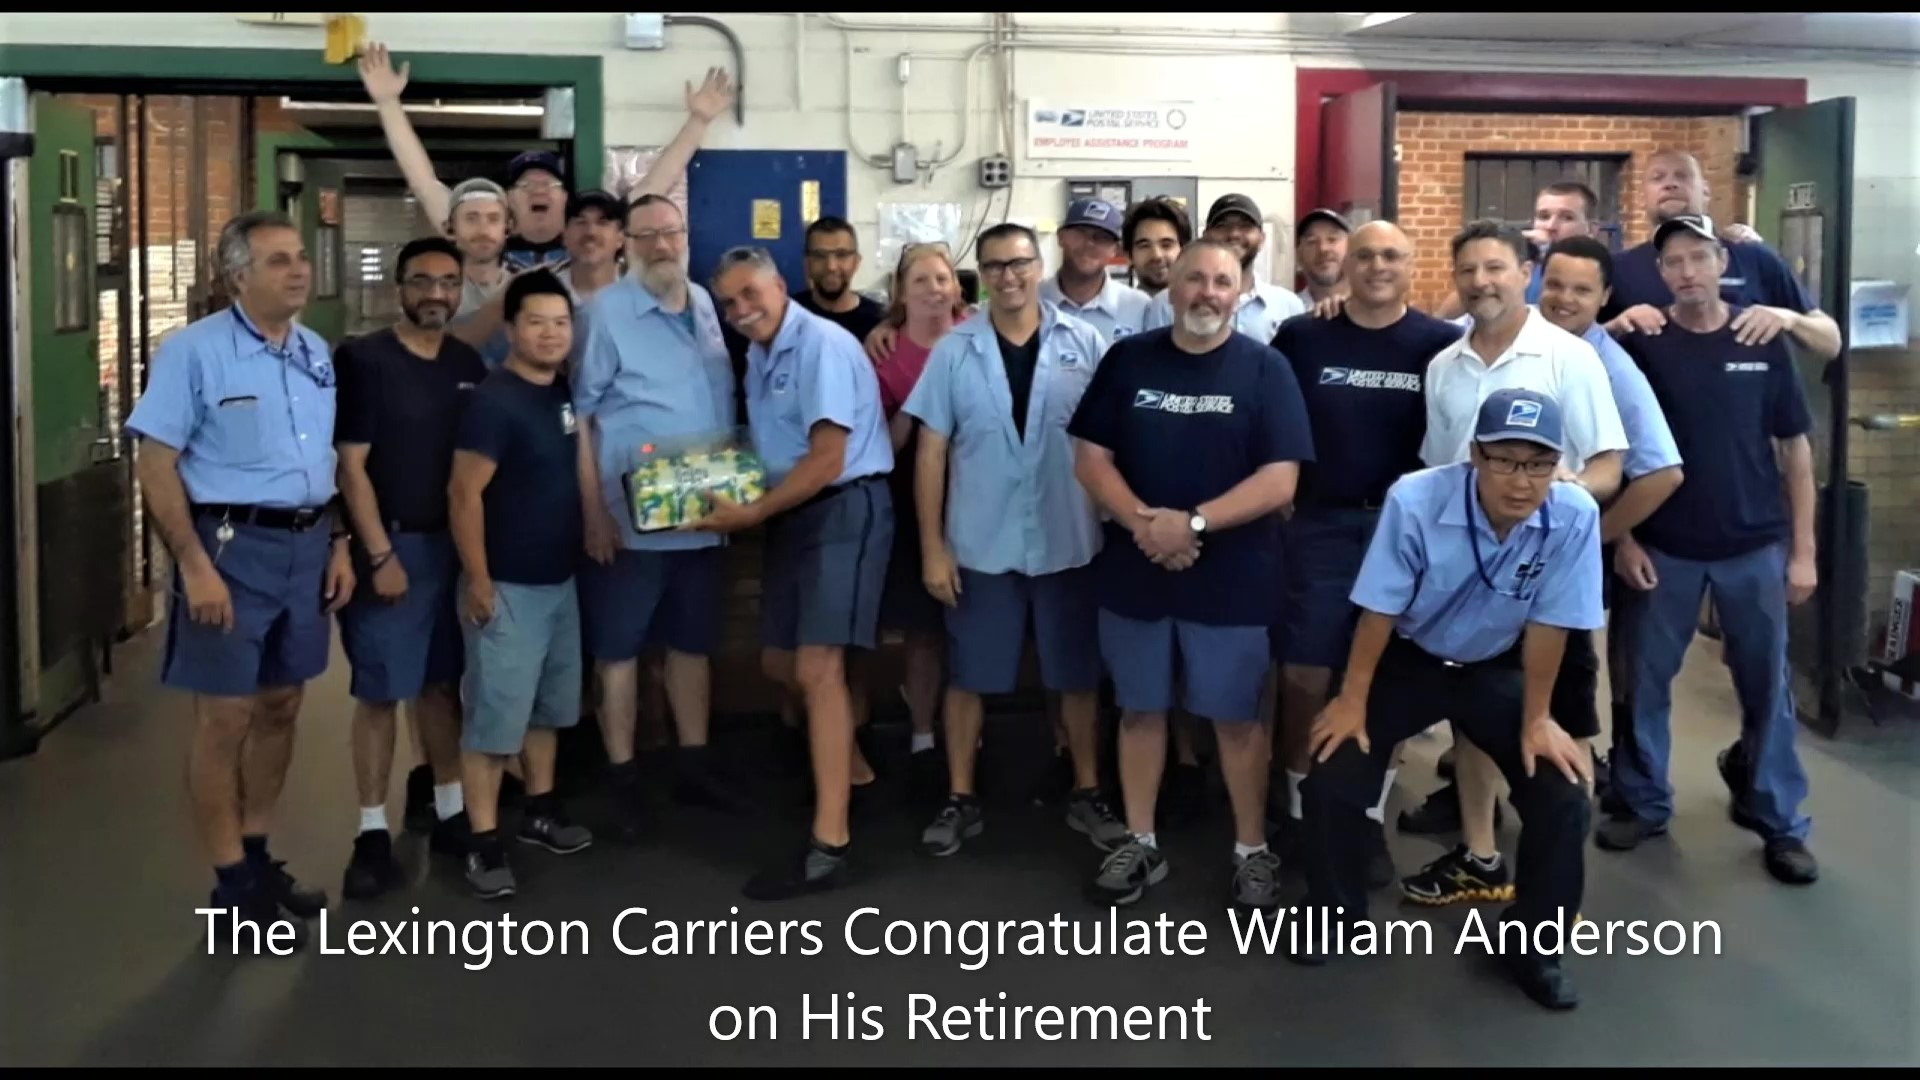 William-Anderson-Lexington-Retires-62019-2_Large_Moment